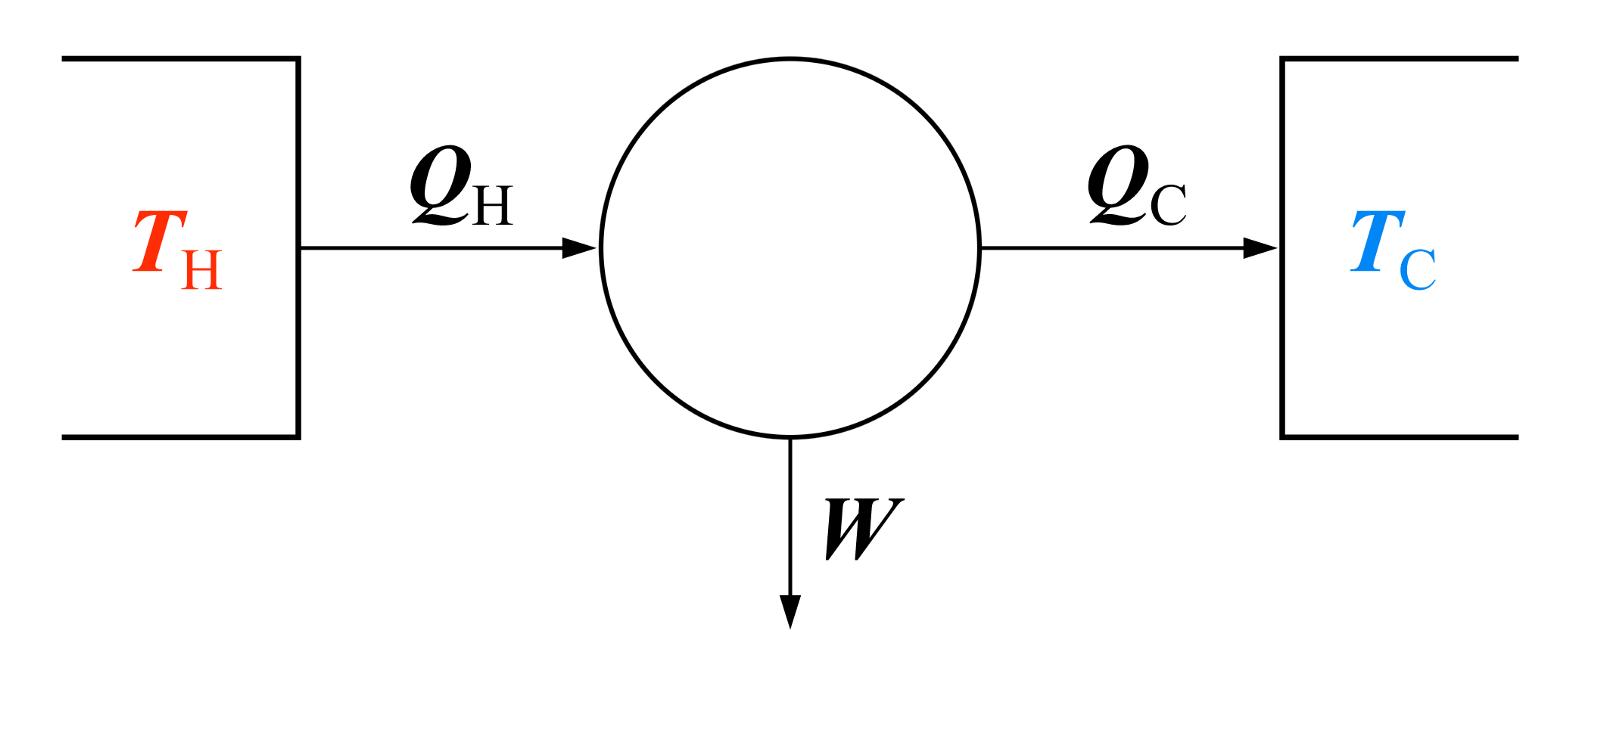 Три закона конфигодинамики - 3